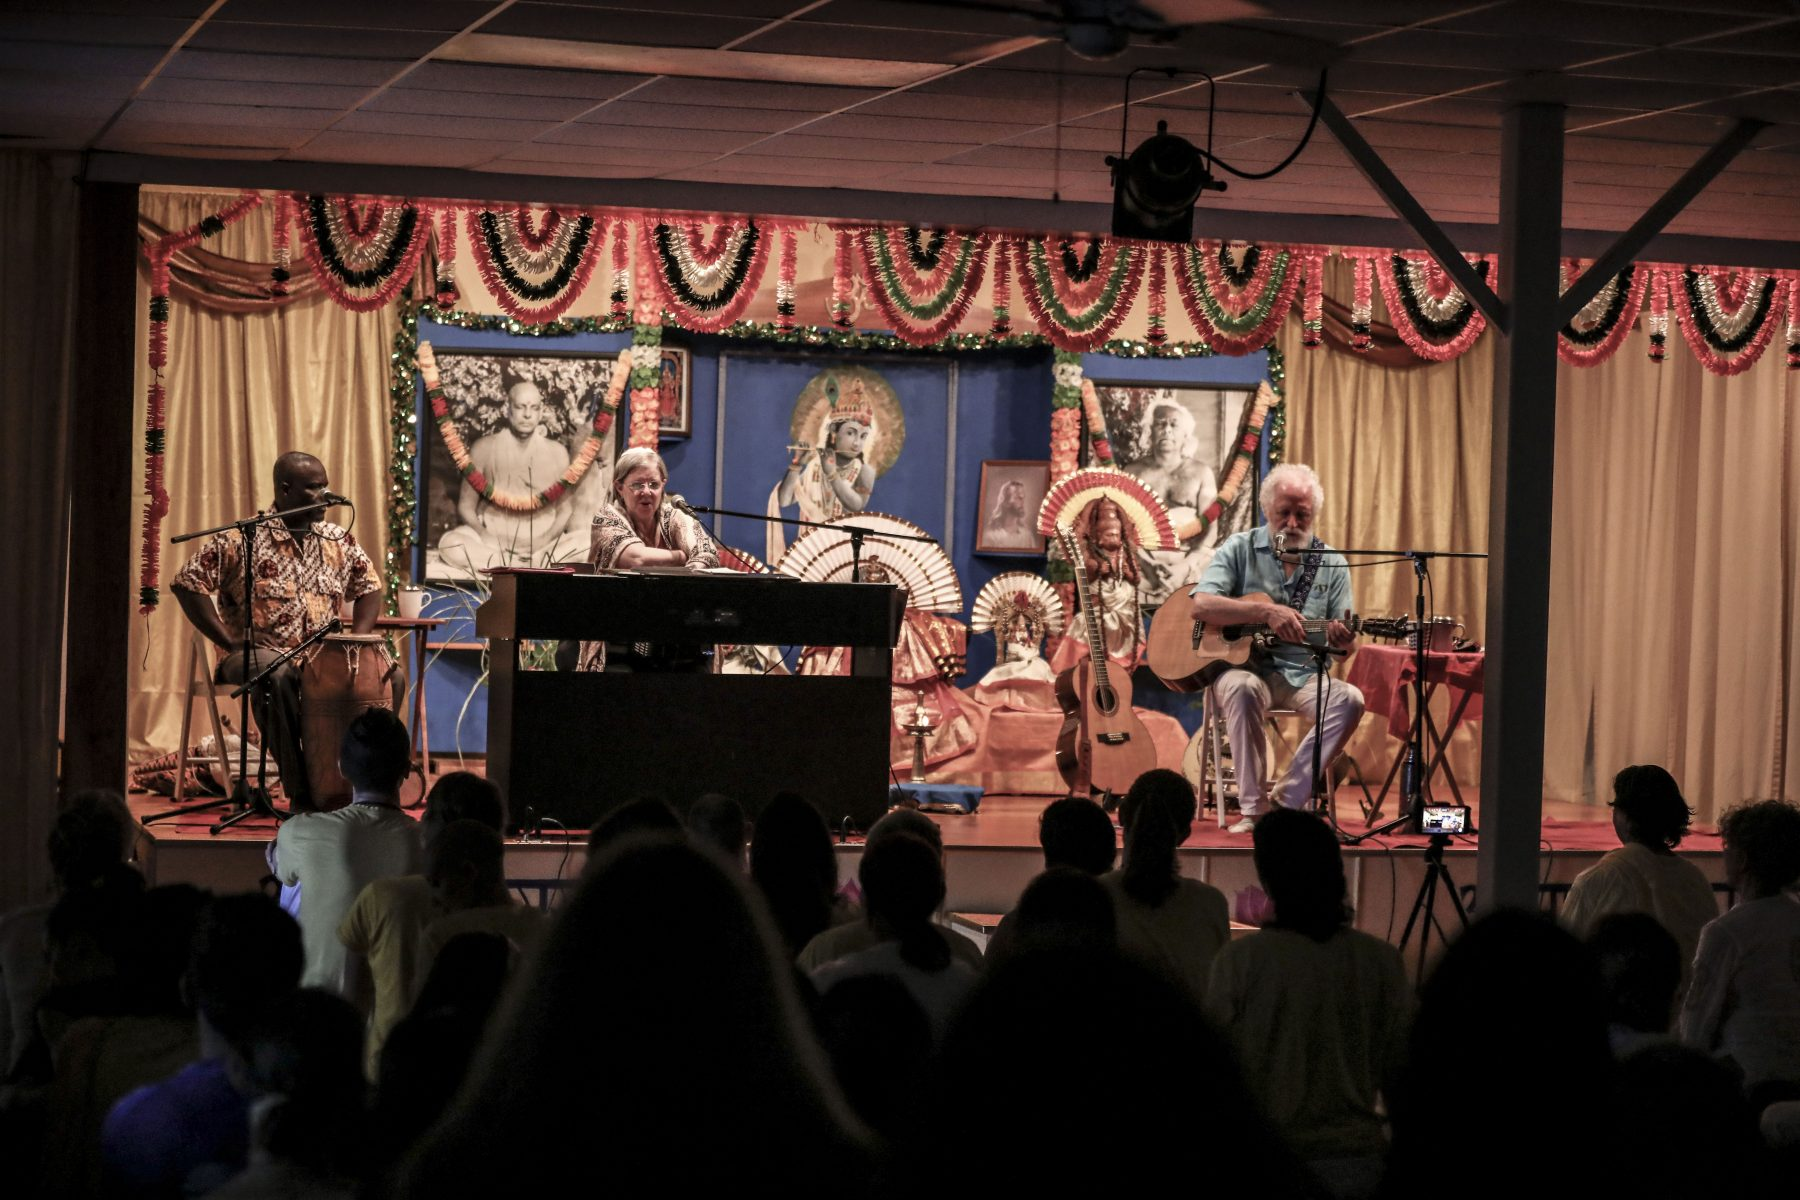 Special Evening Satsang: The Joy of Music - Concert with Rabbi Zoe B. Zak & Ken Whiteley at the Sivananda Yoga Ranch